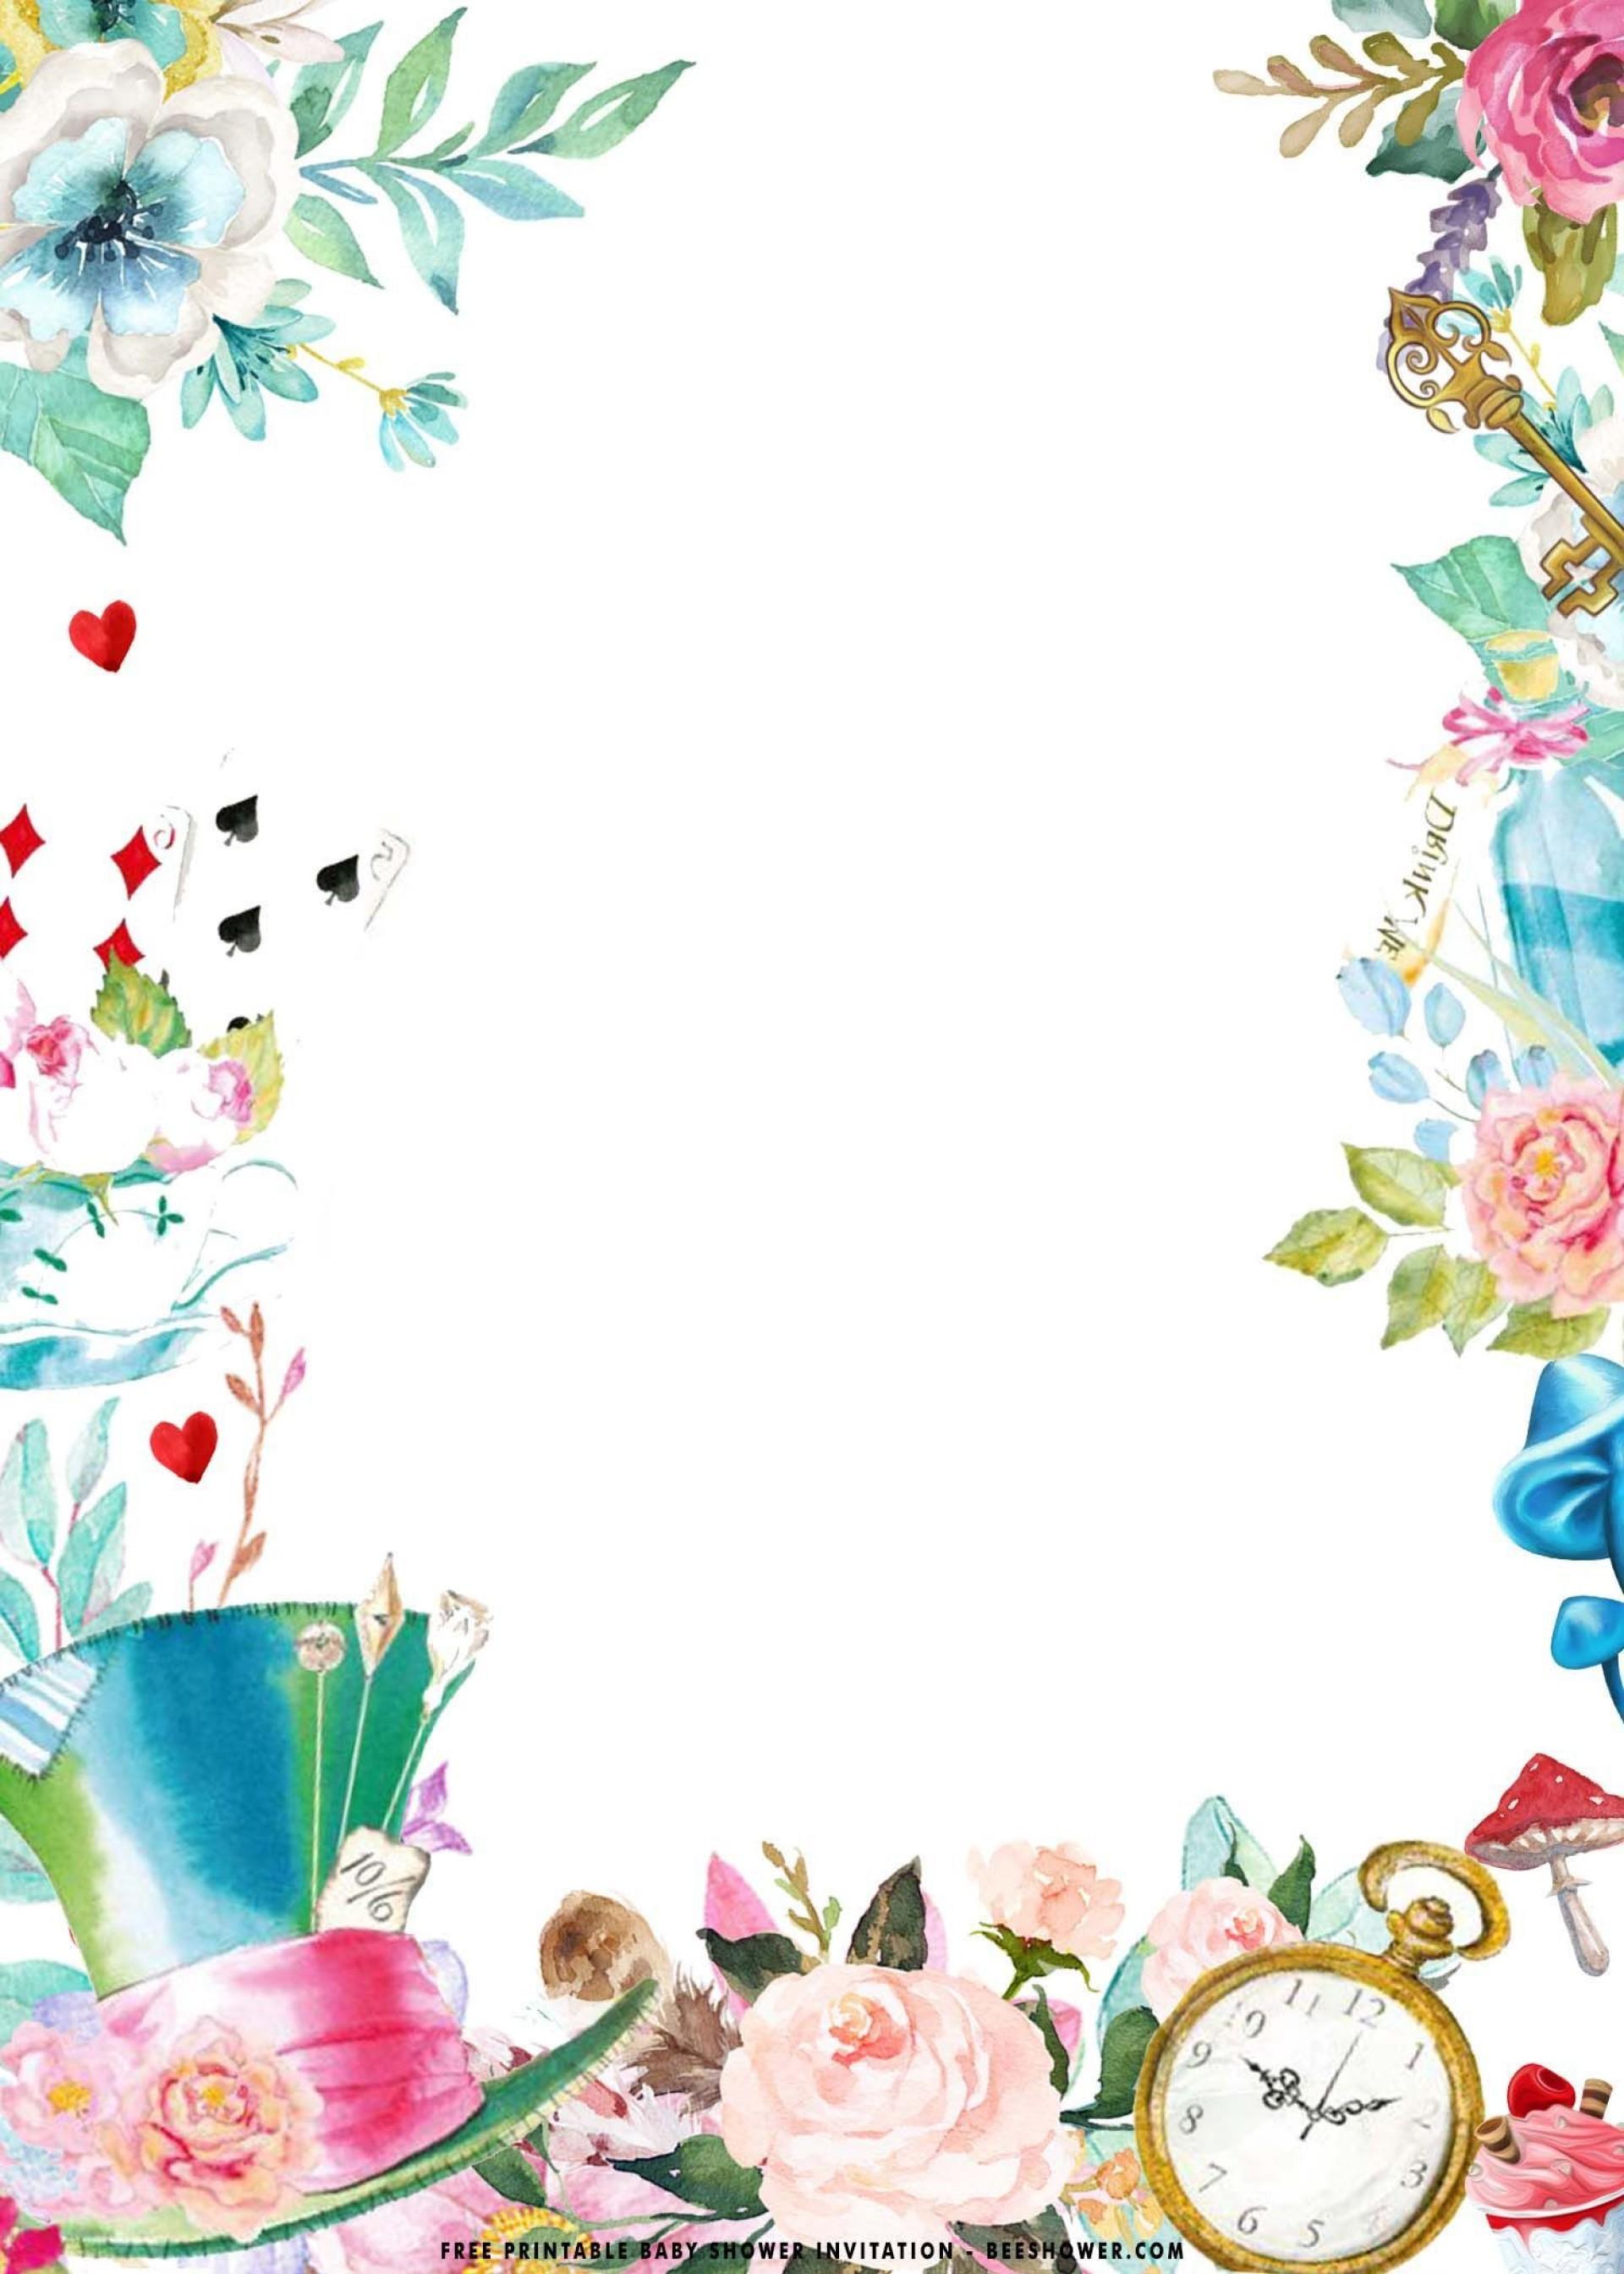 003 Incredible Alice In Wonderland Tea Party Template Design  Templates Invitation Free1920